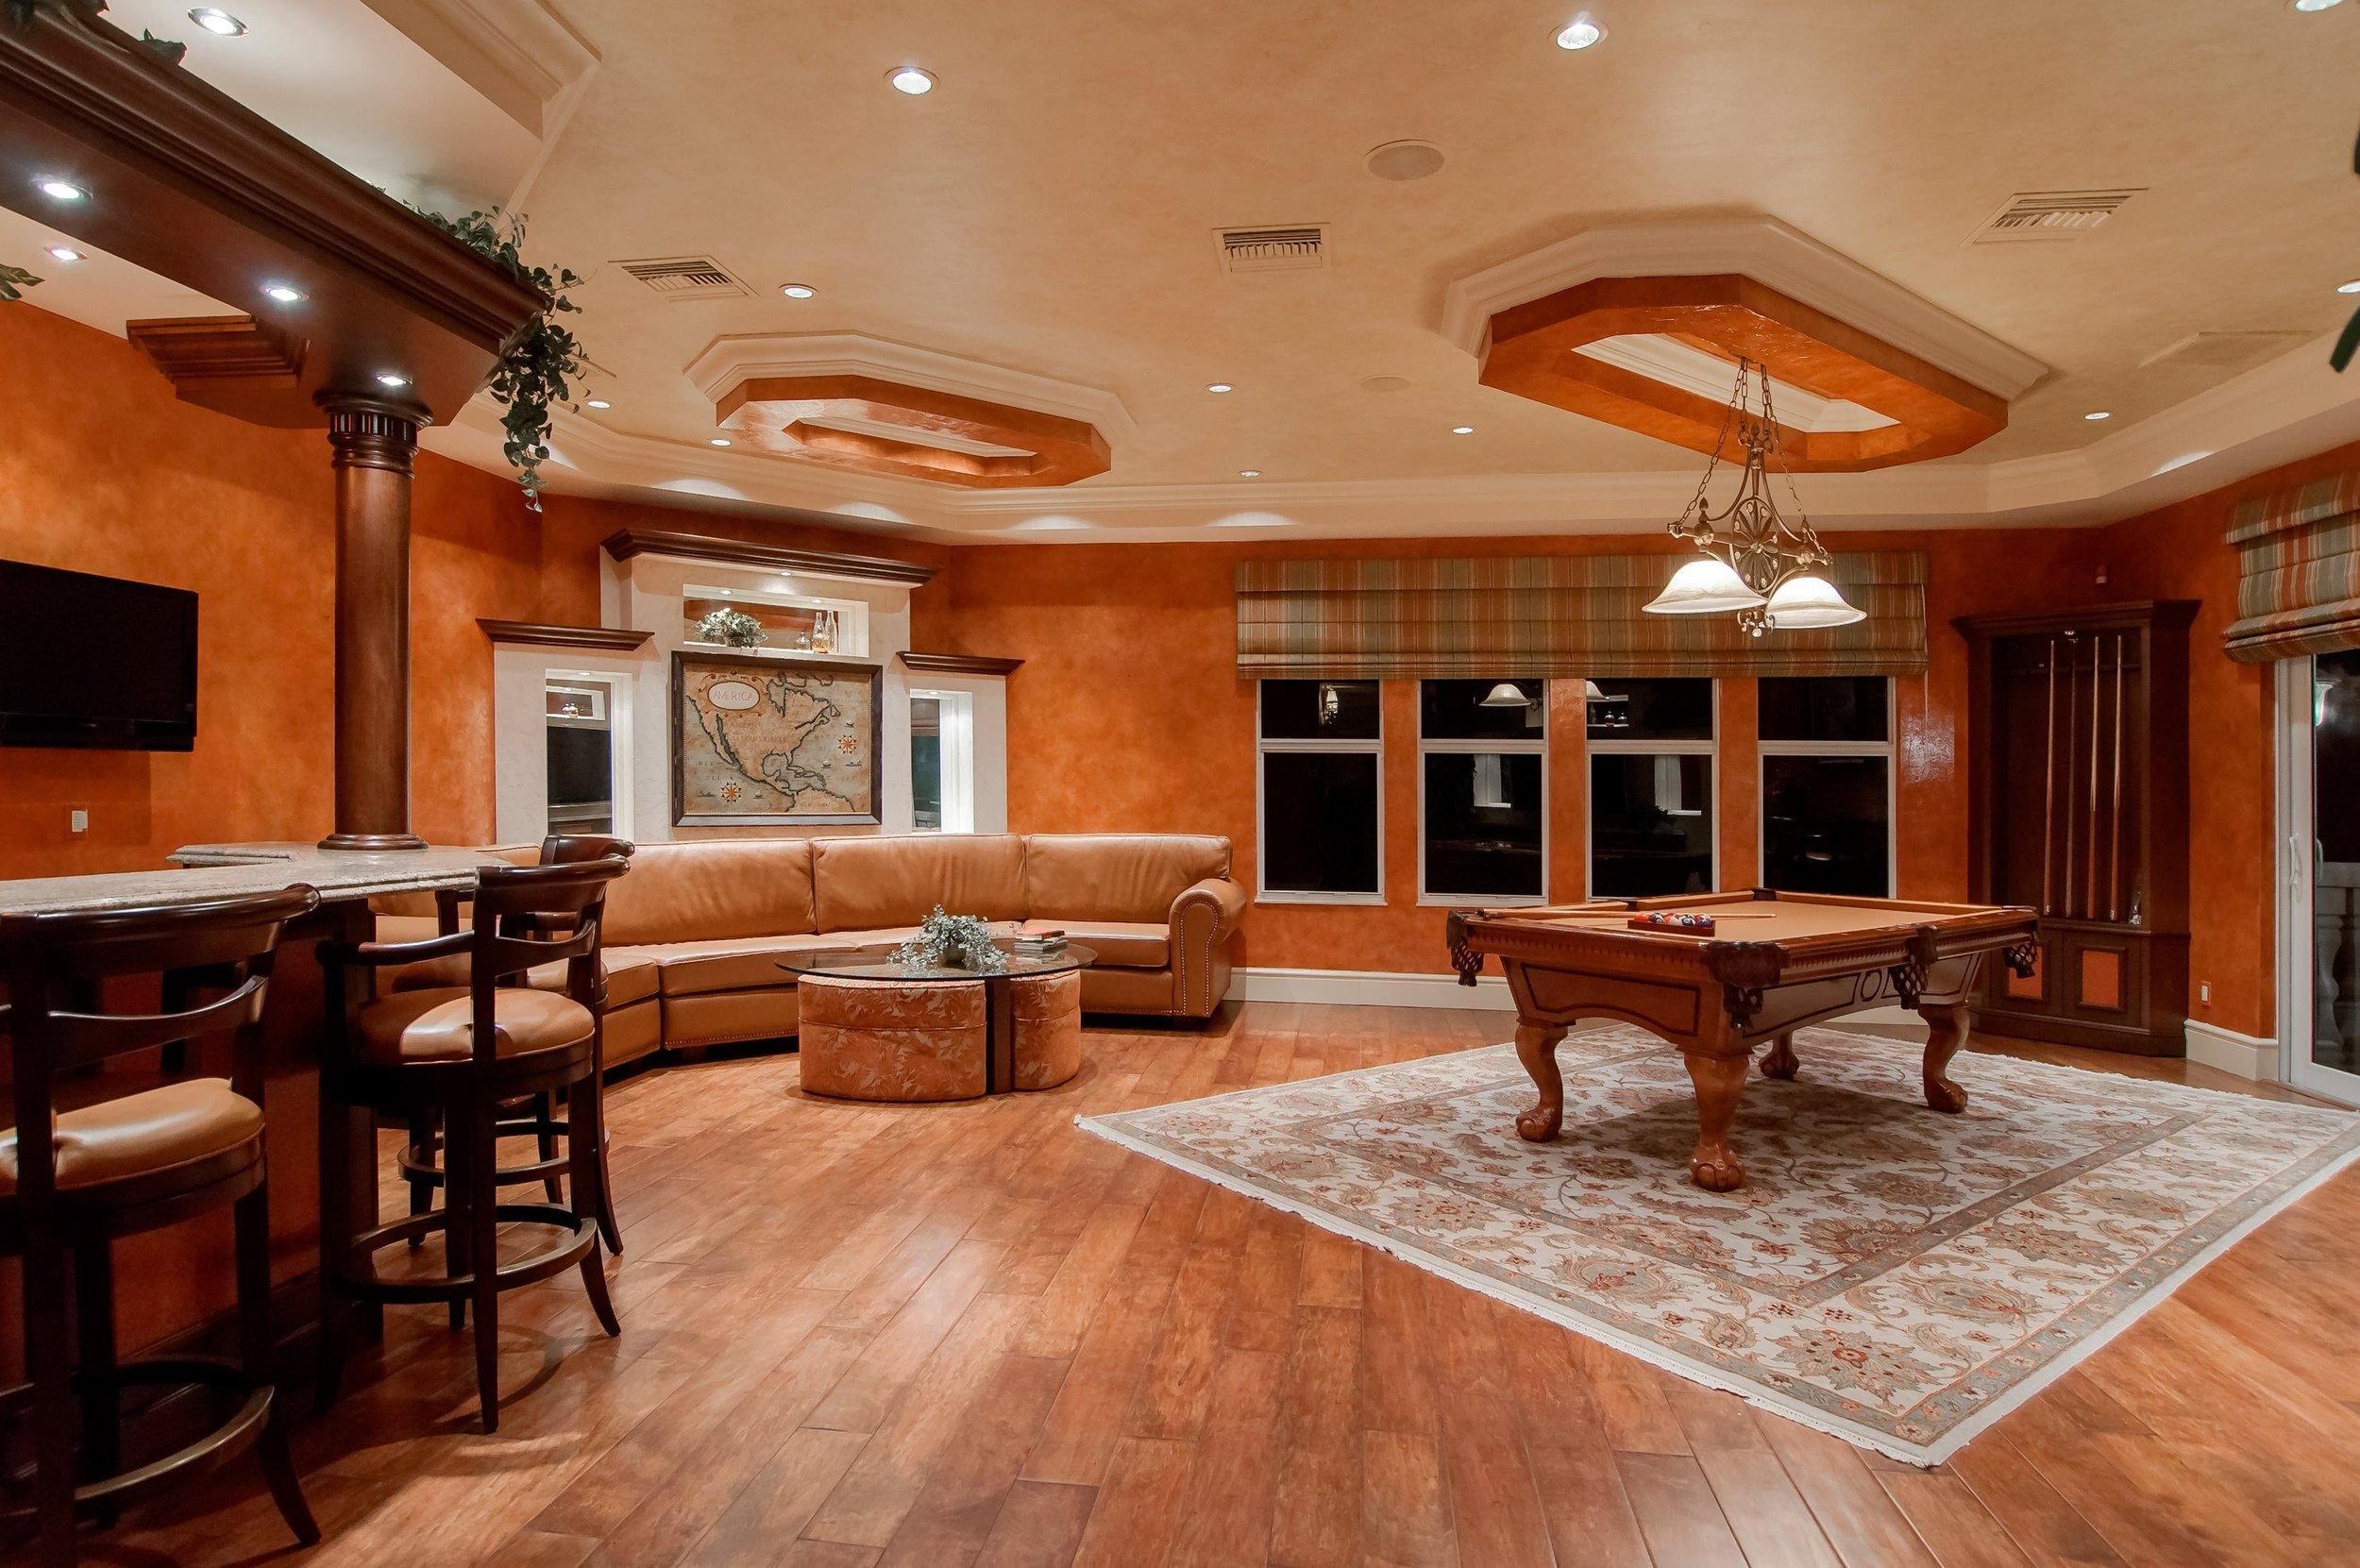 ozburn-hessey-nashville-tn-extend-life-of-hardwood-floors.jpg